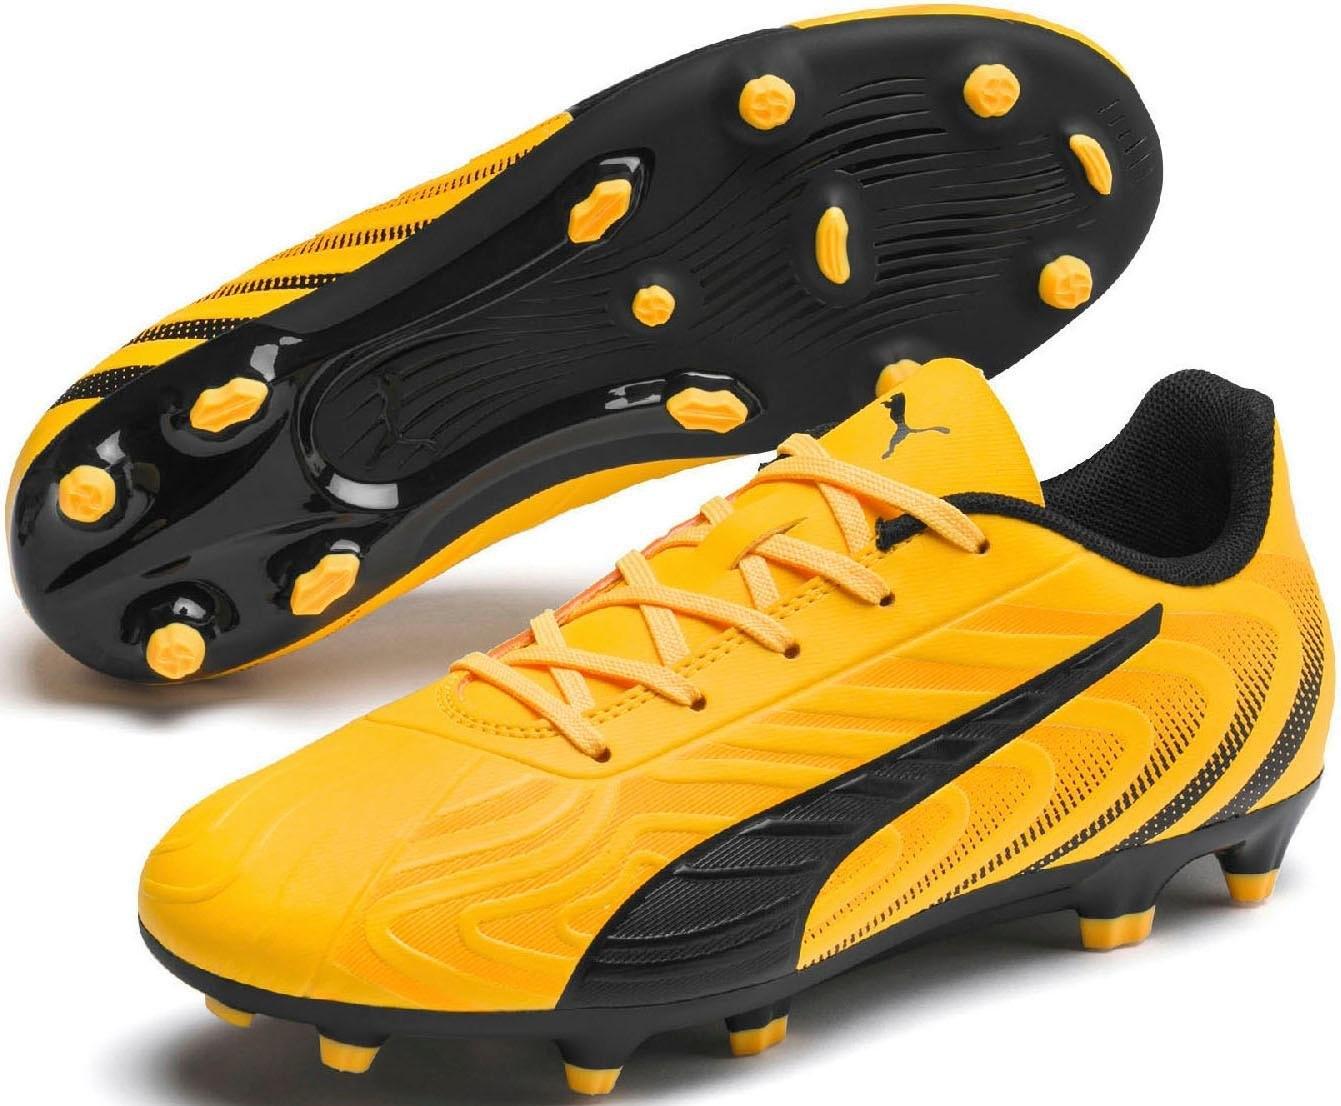 Puma voetbalschoenen »PUMA ONE 20.4 FG/AG Jr« nu online kopen bij OTTO